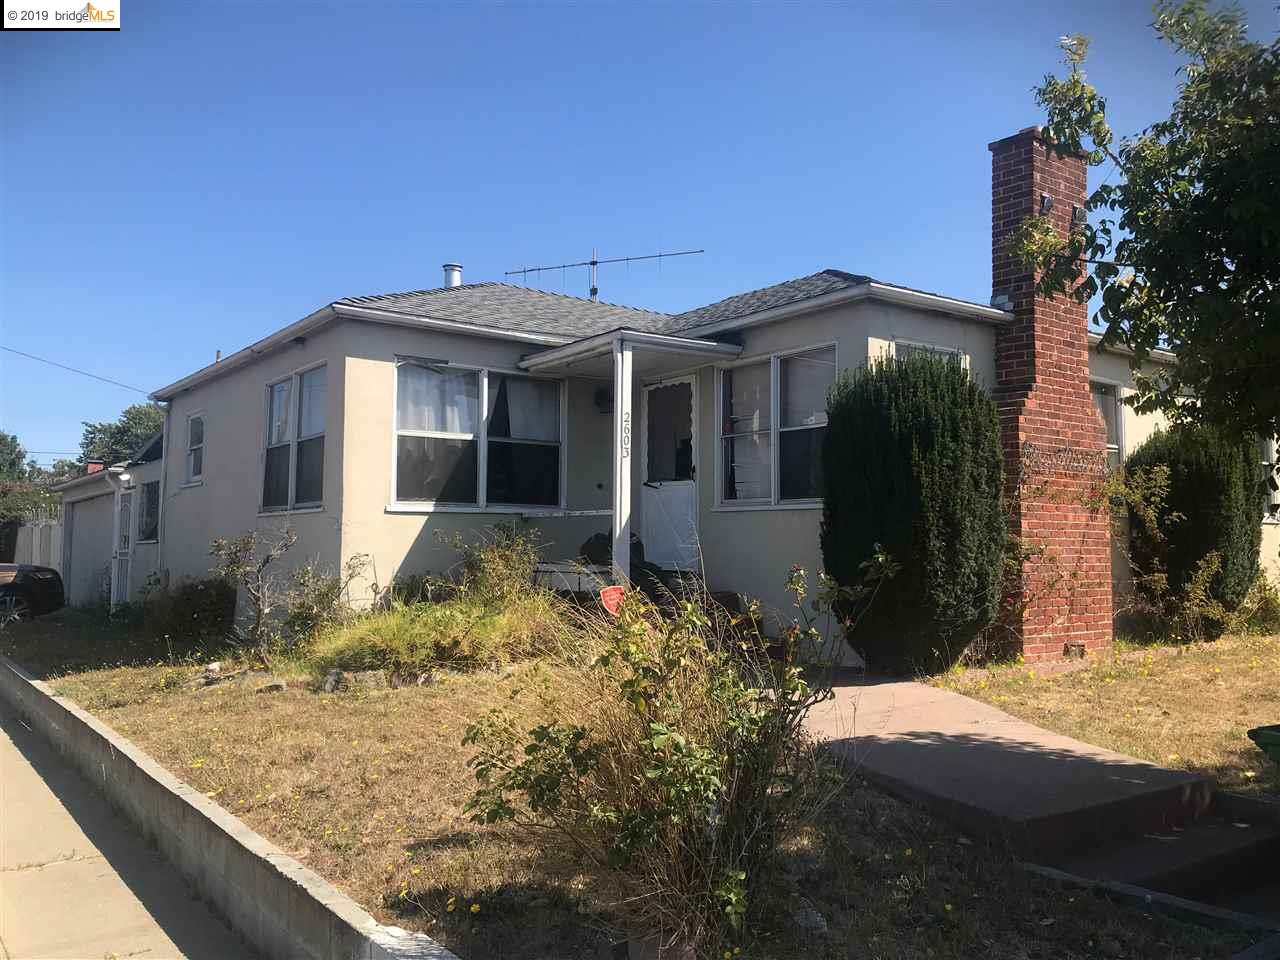 2603 MCBRYDE AVE, RICHMOND, CA 94804